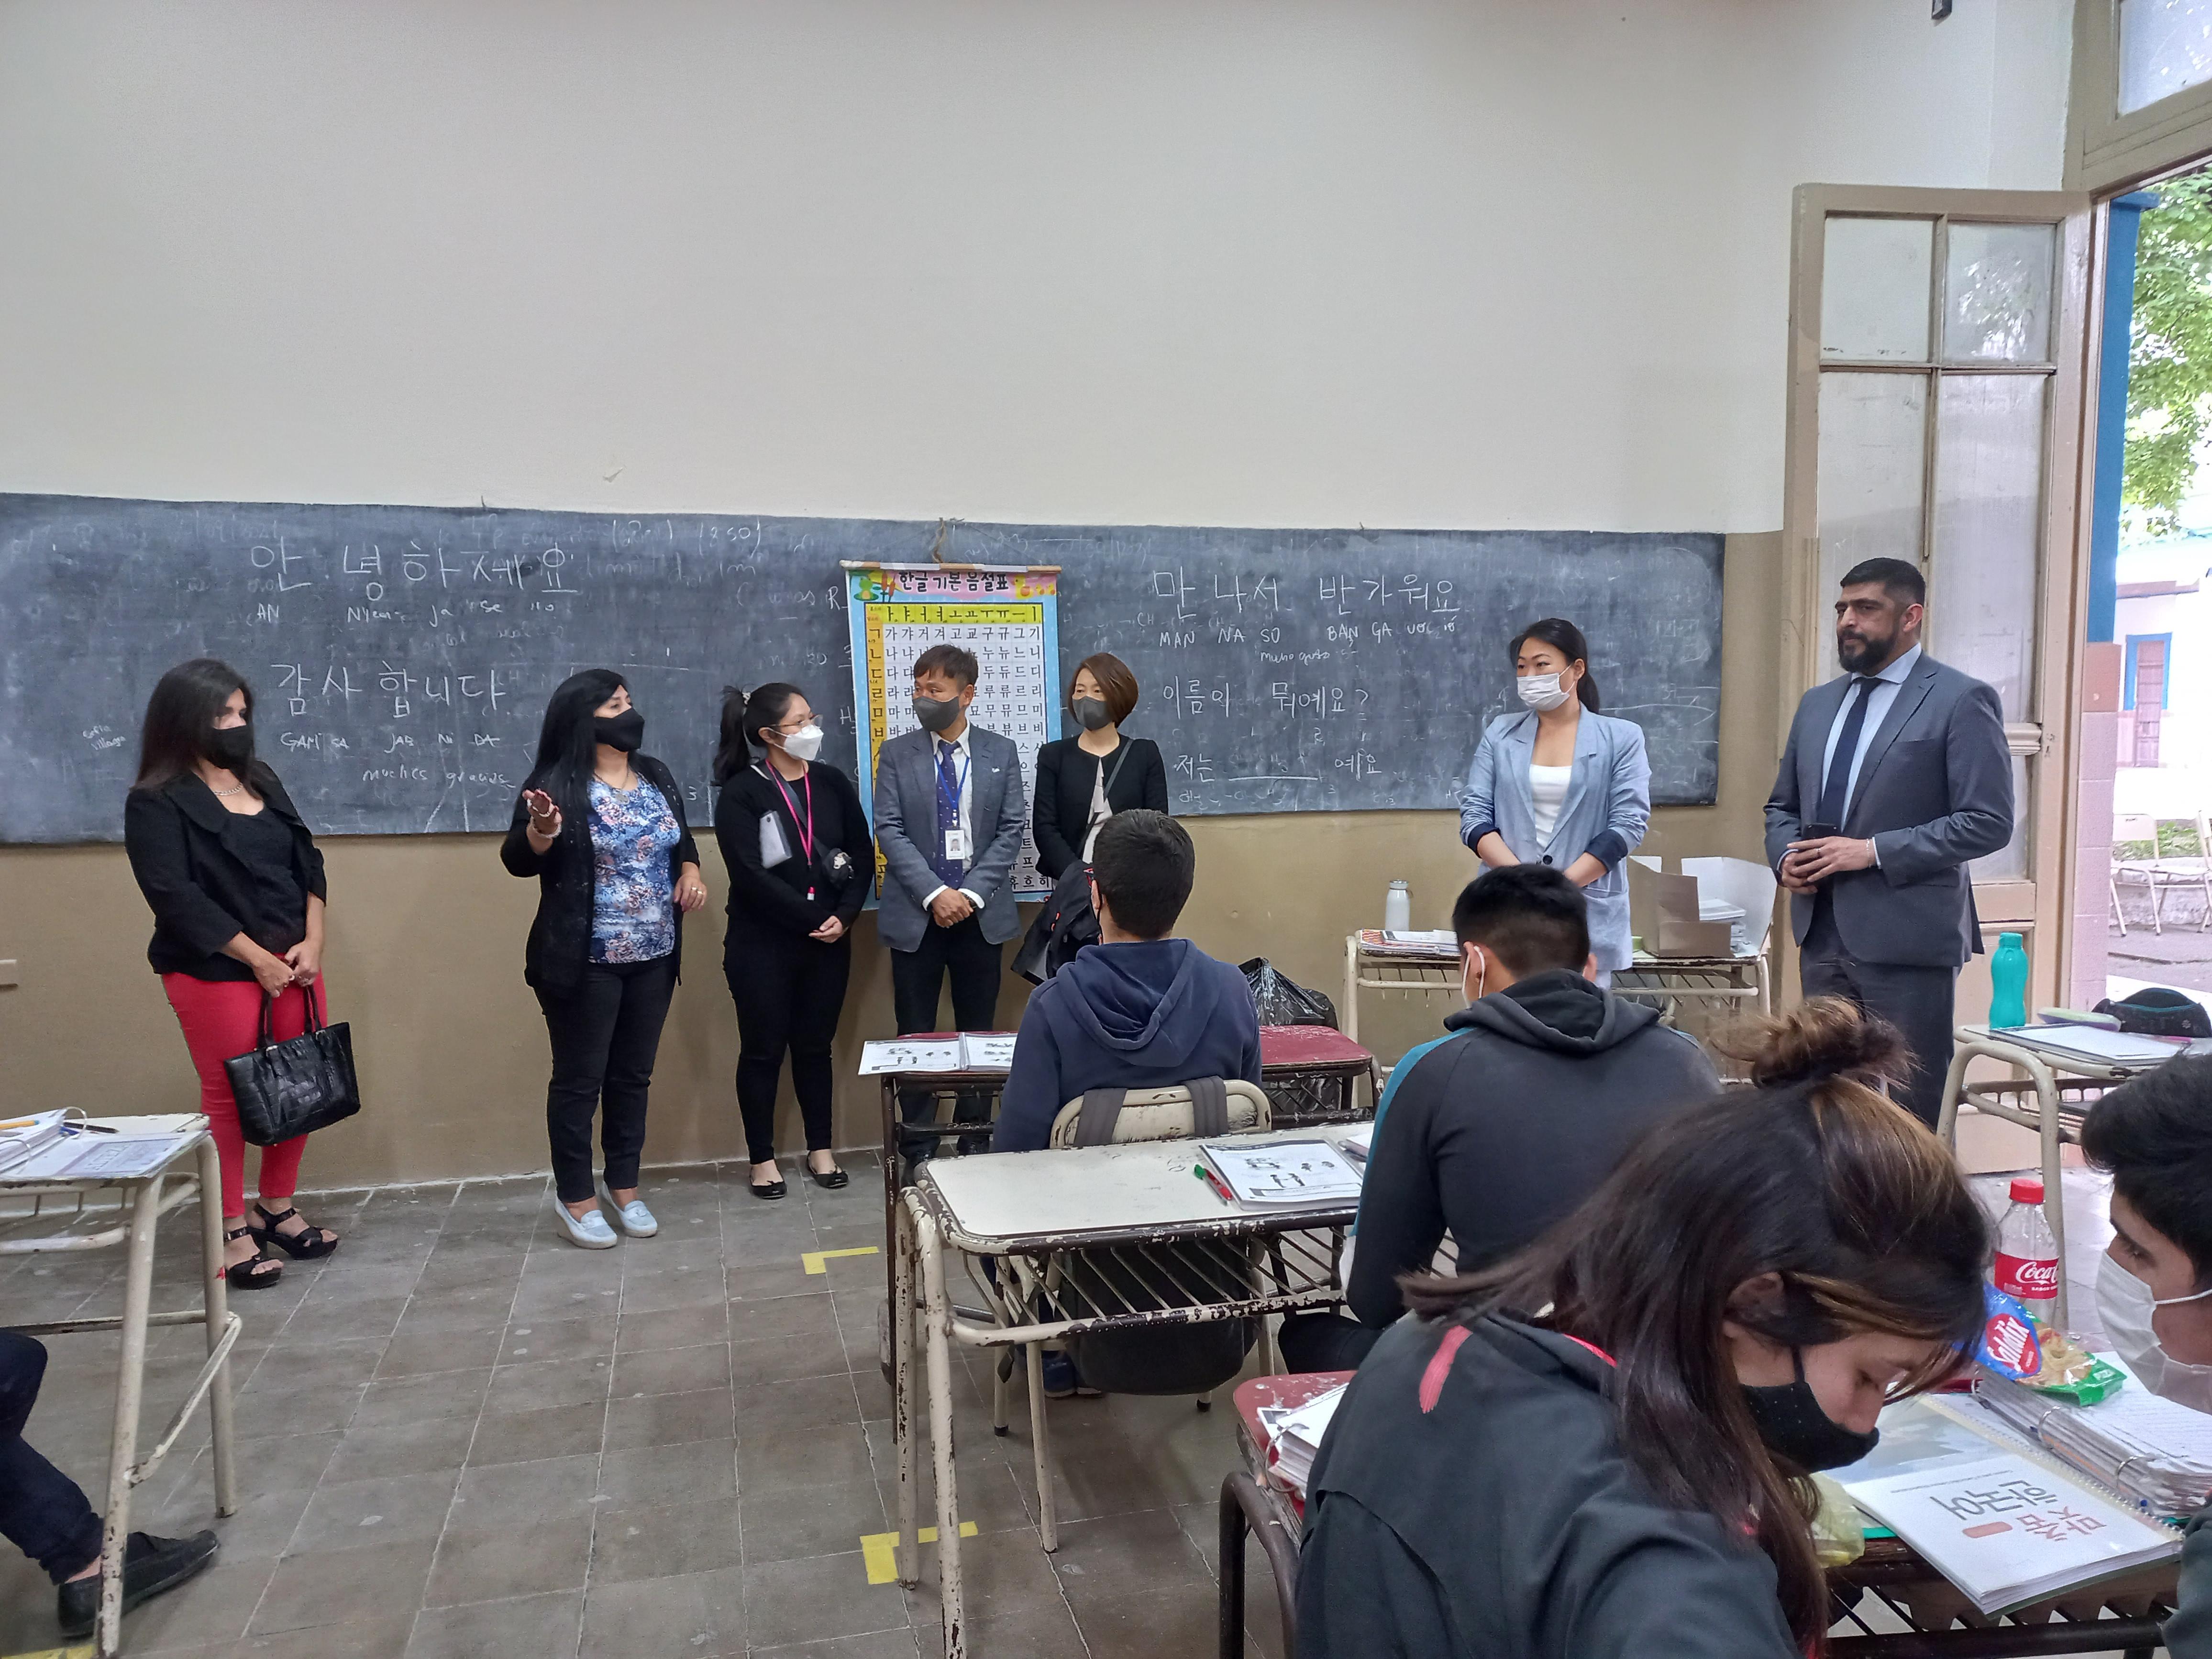 Nacional Mitre중고등학교 방문 (10).jpg